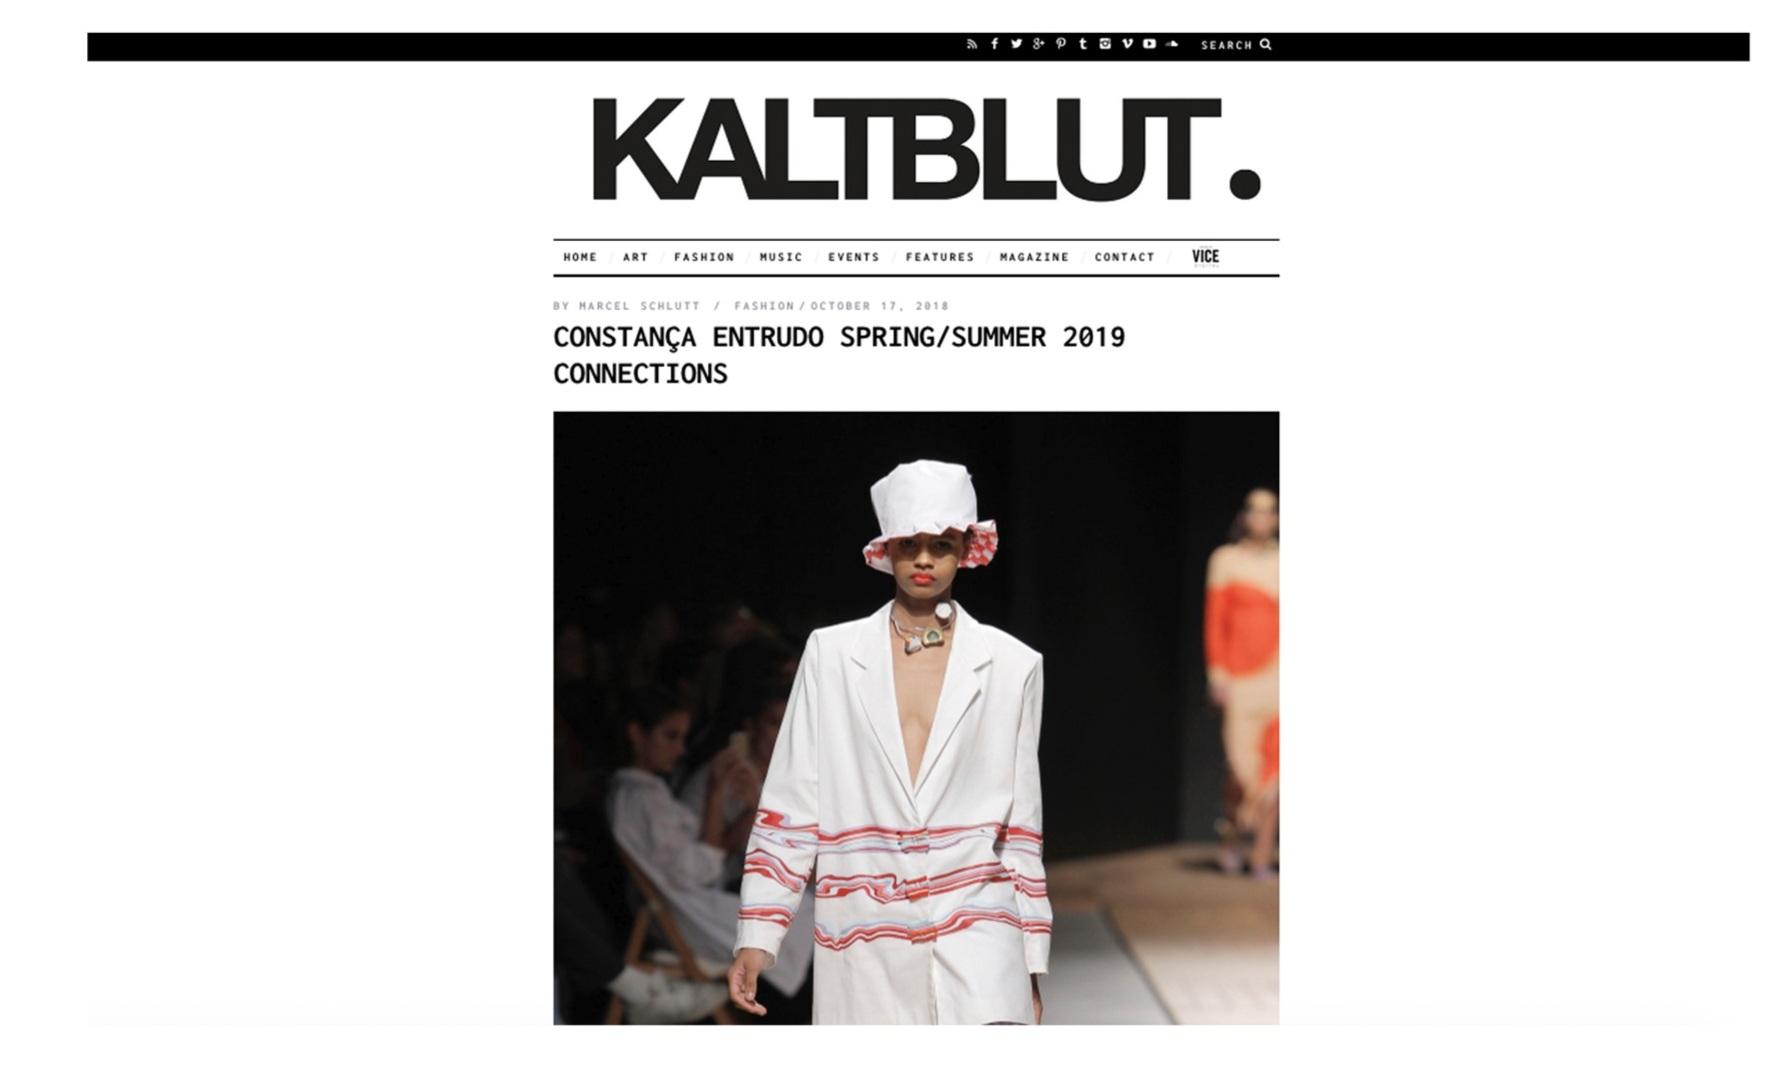 https://www.kaltblut-magazine.com/constanca-entrudo-spring-summer-2019-connections/